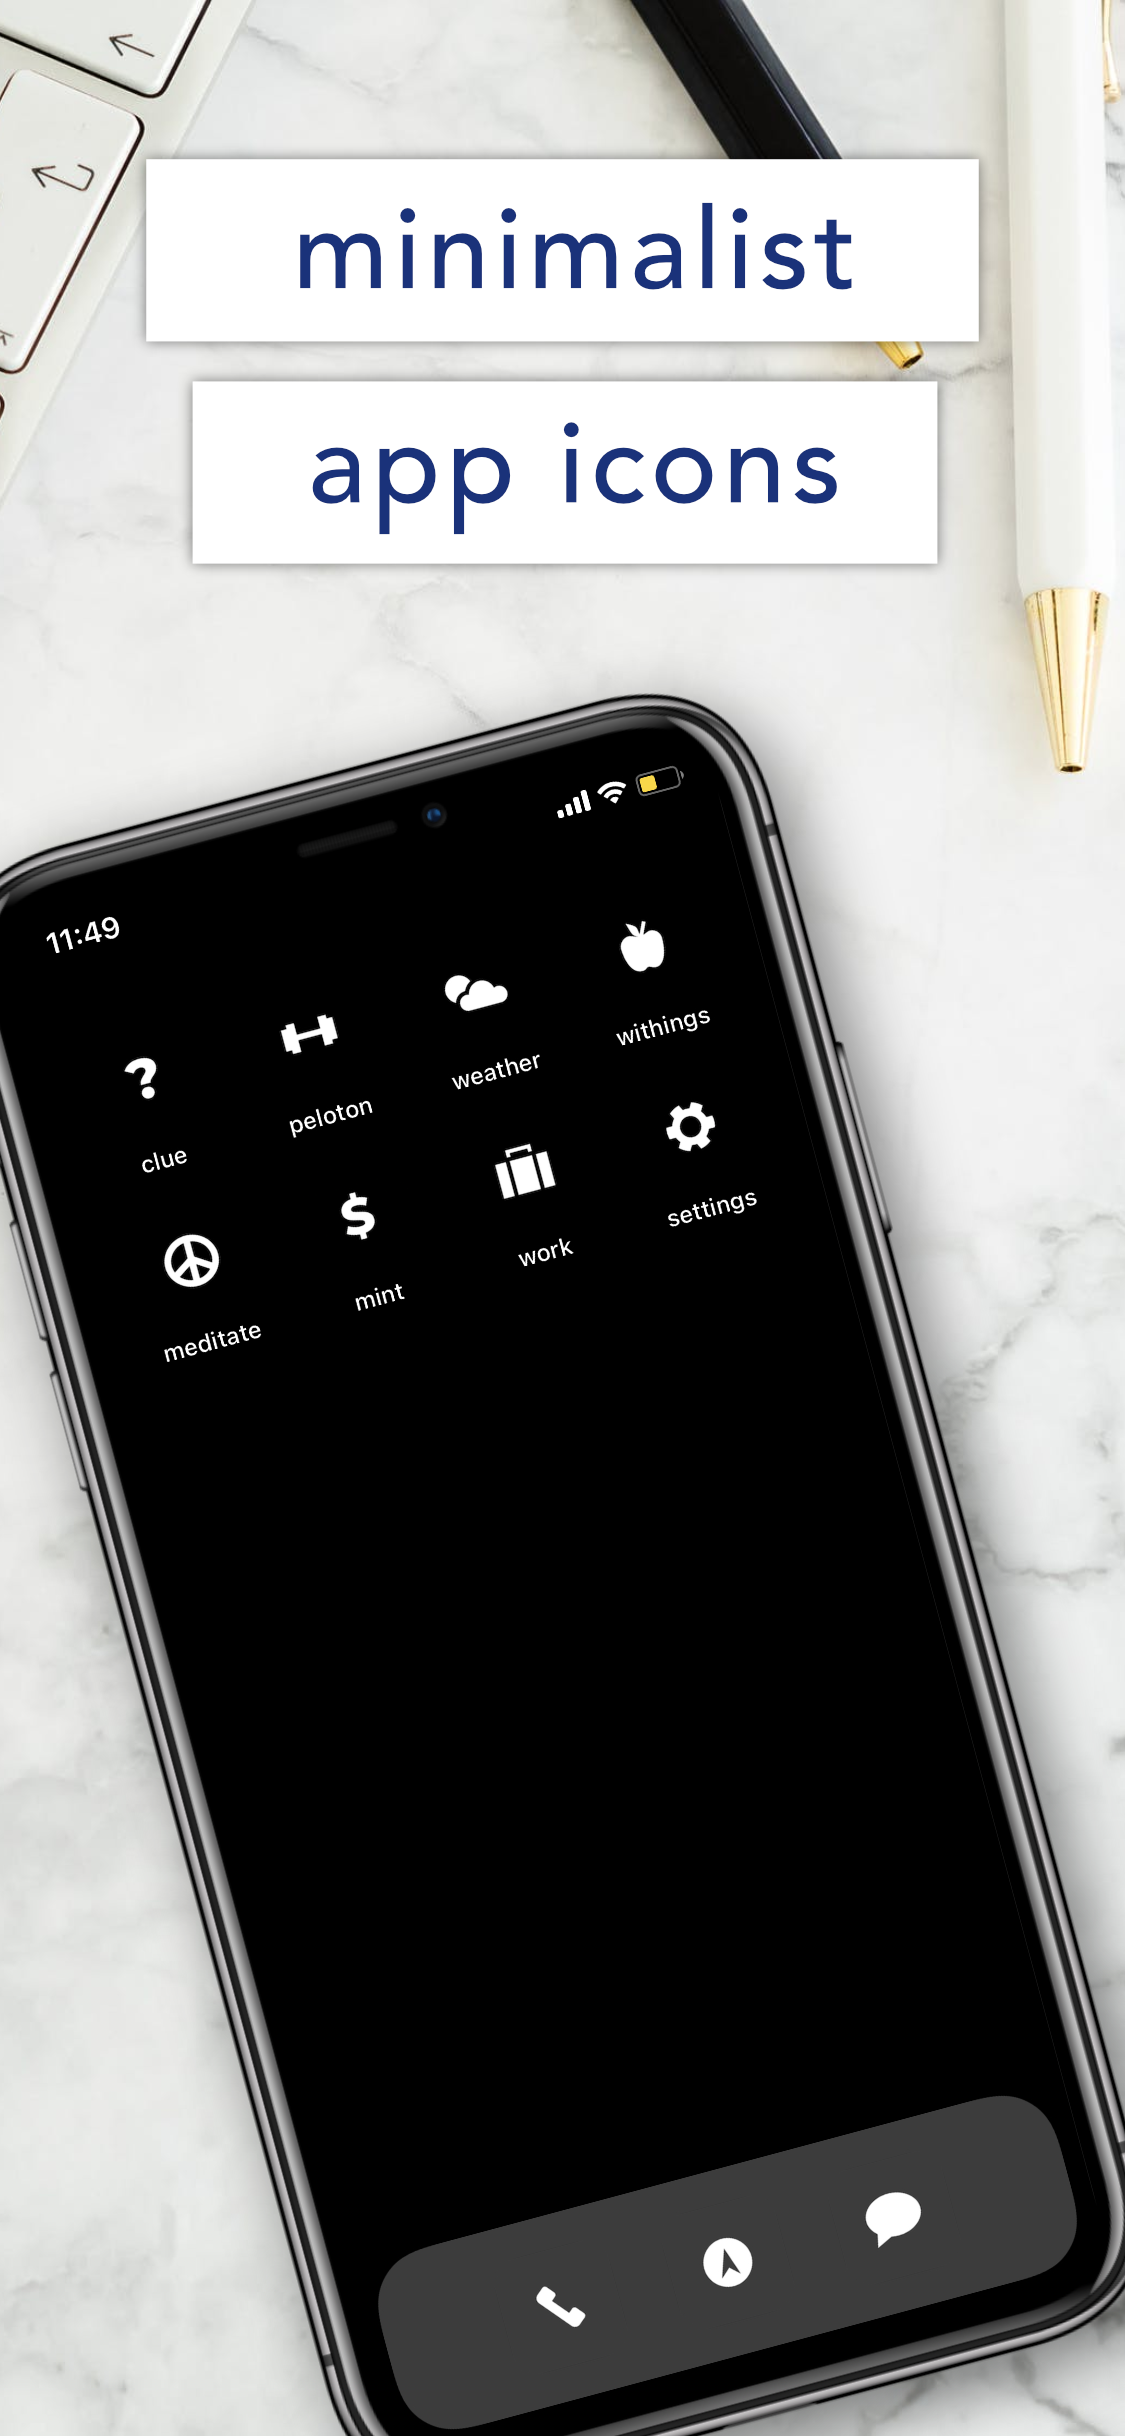 Minimalsist Invisible Black And Gray Background Etsy App Icon Gray Background Plain Black Background